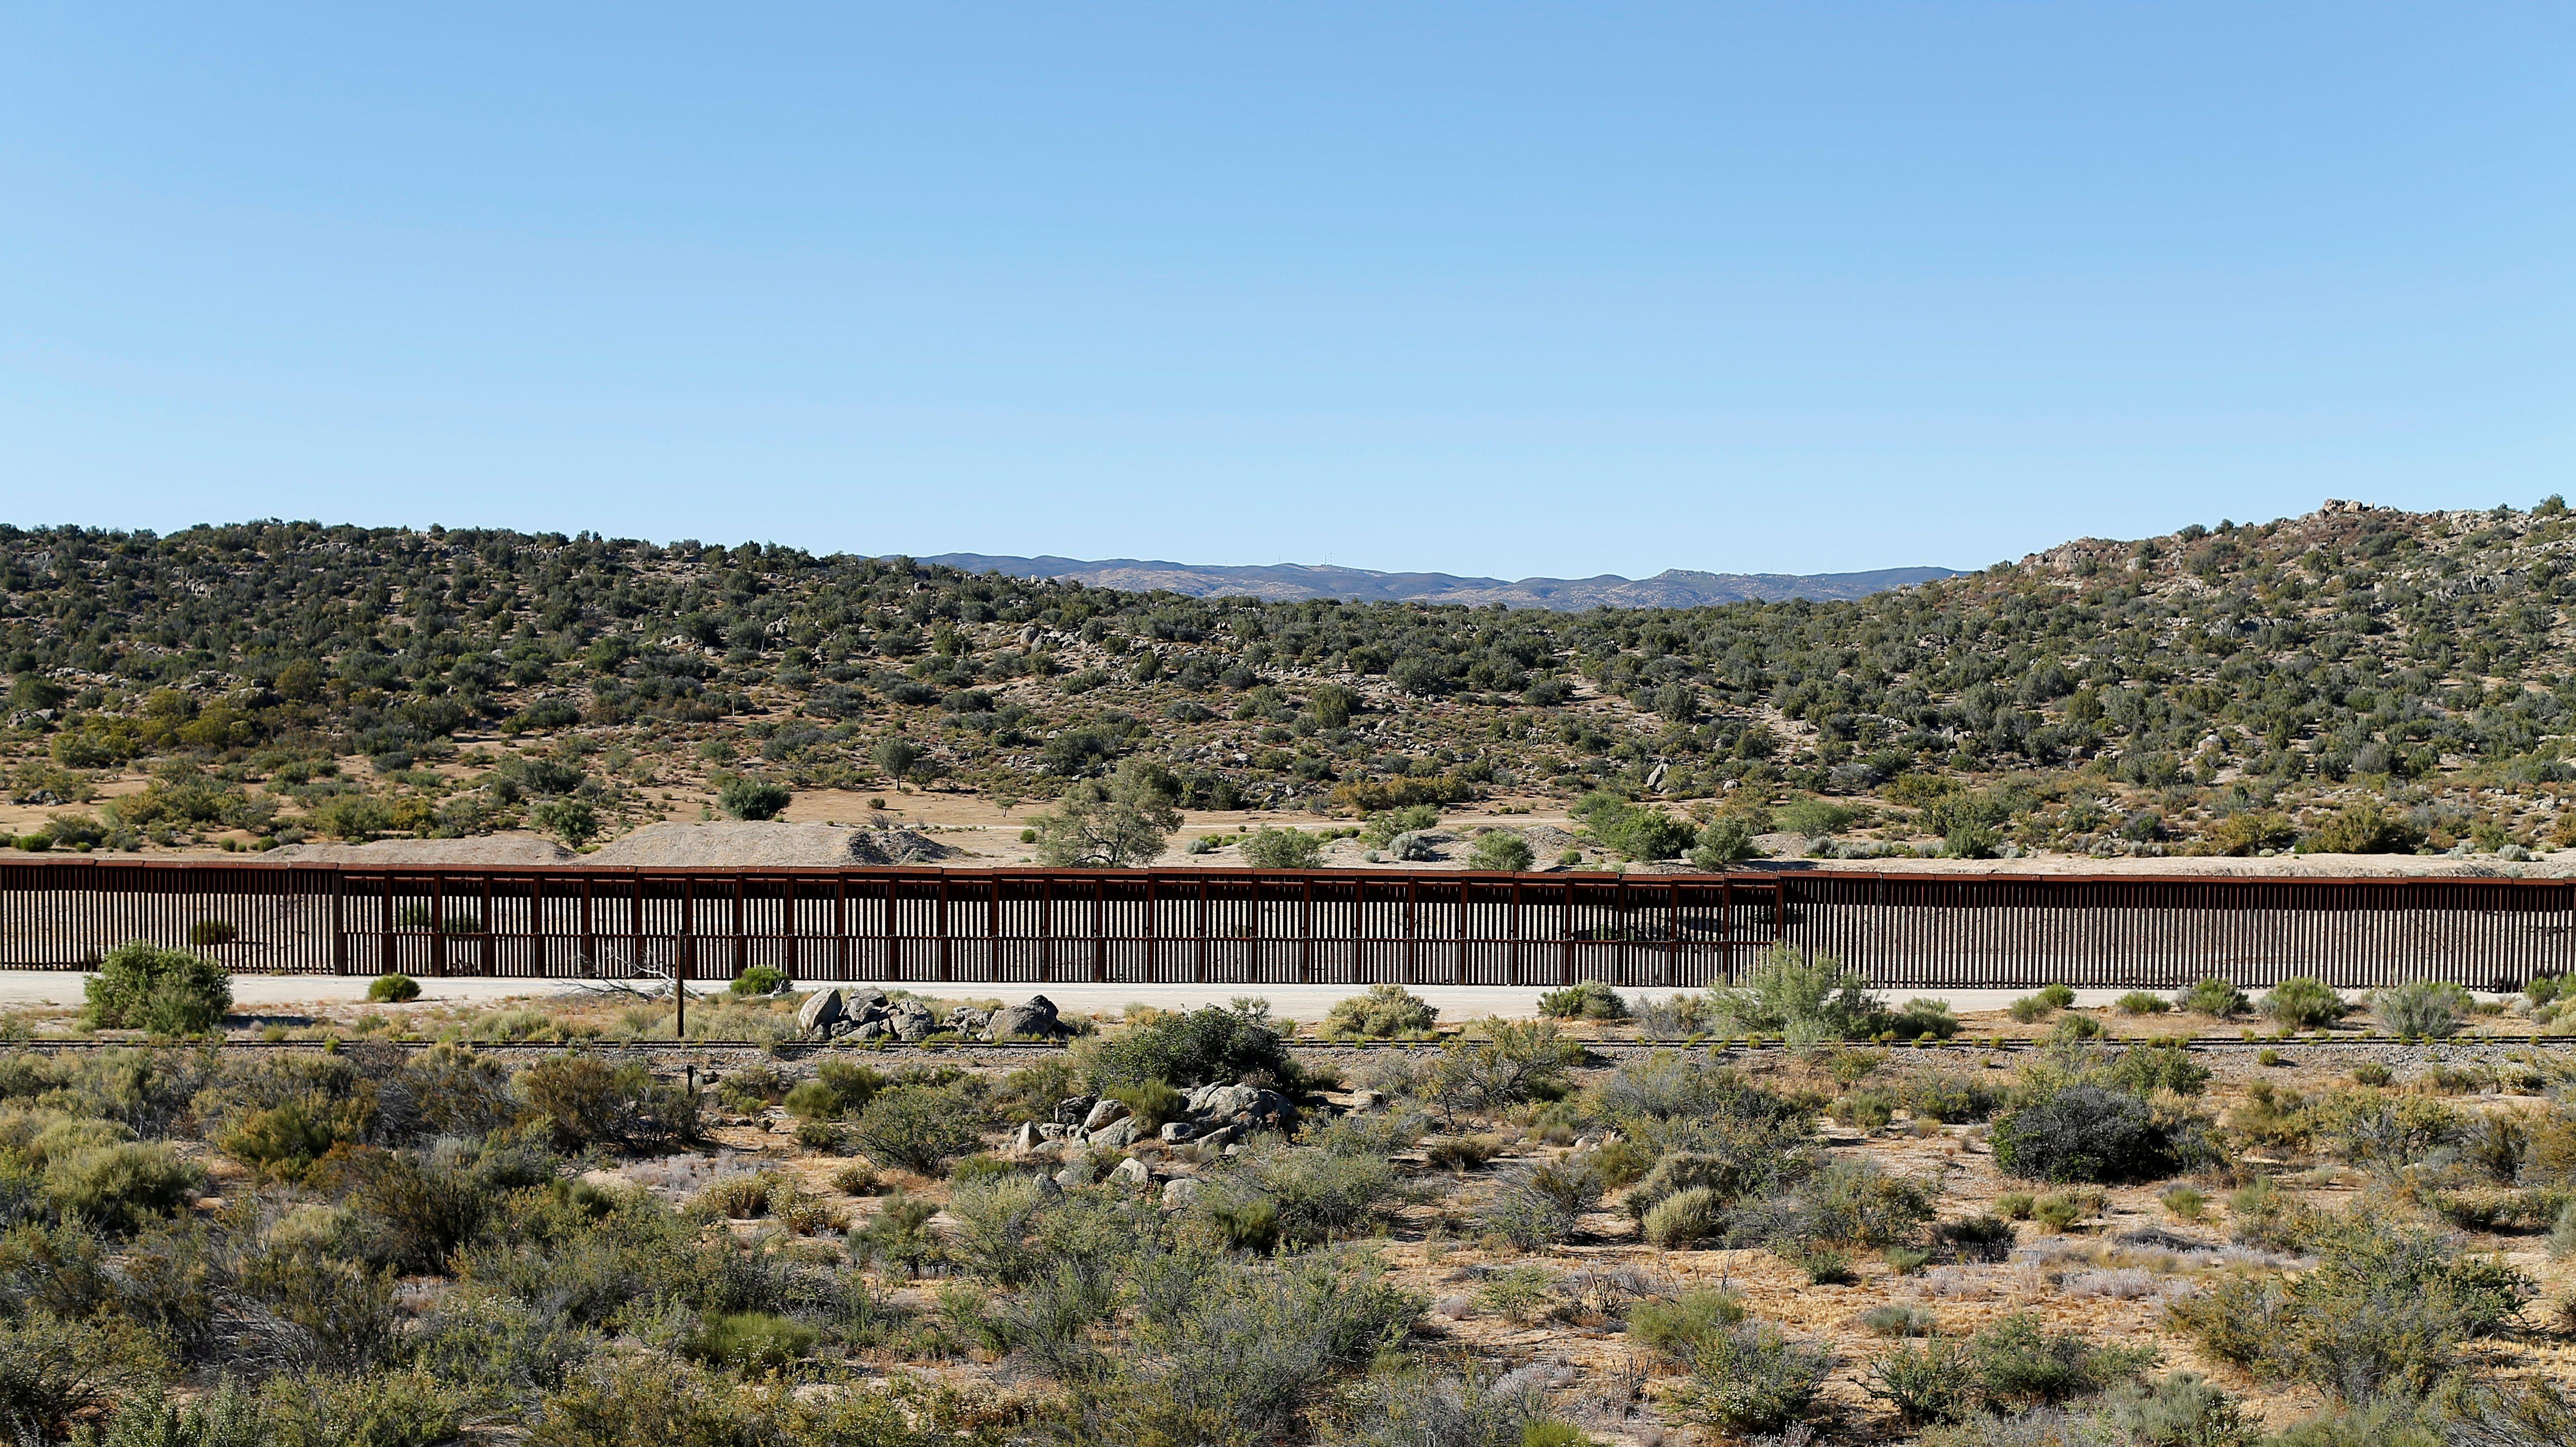 Border fence in Jacumba Hot Springs, California